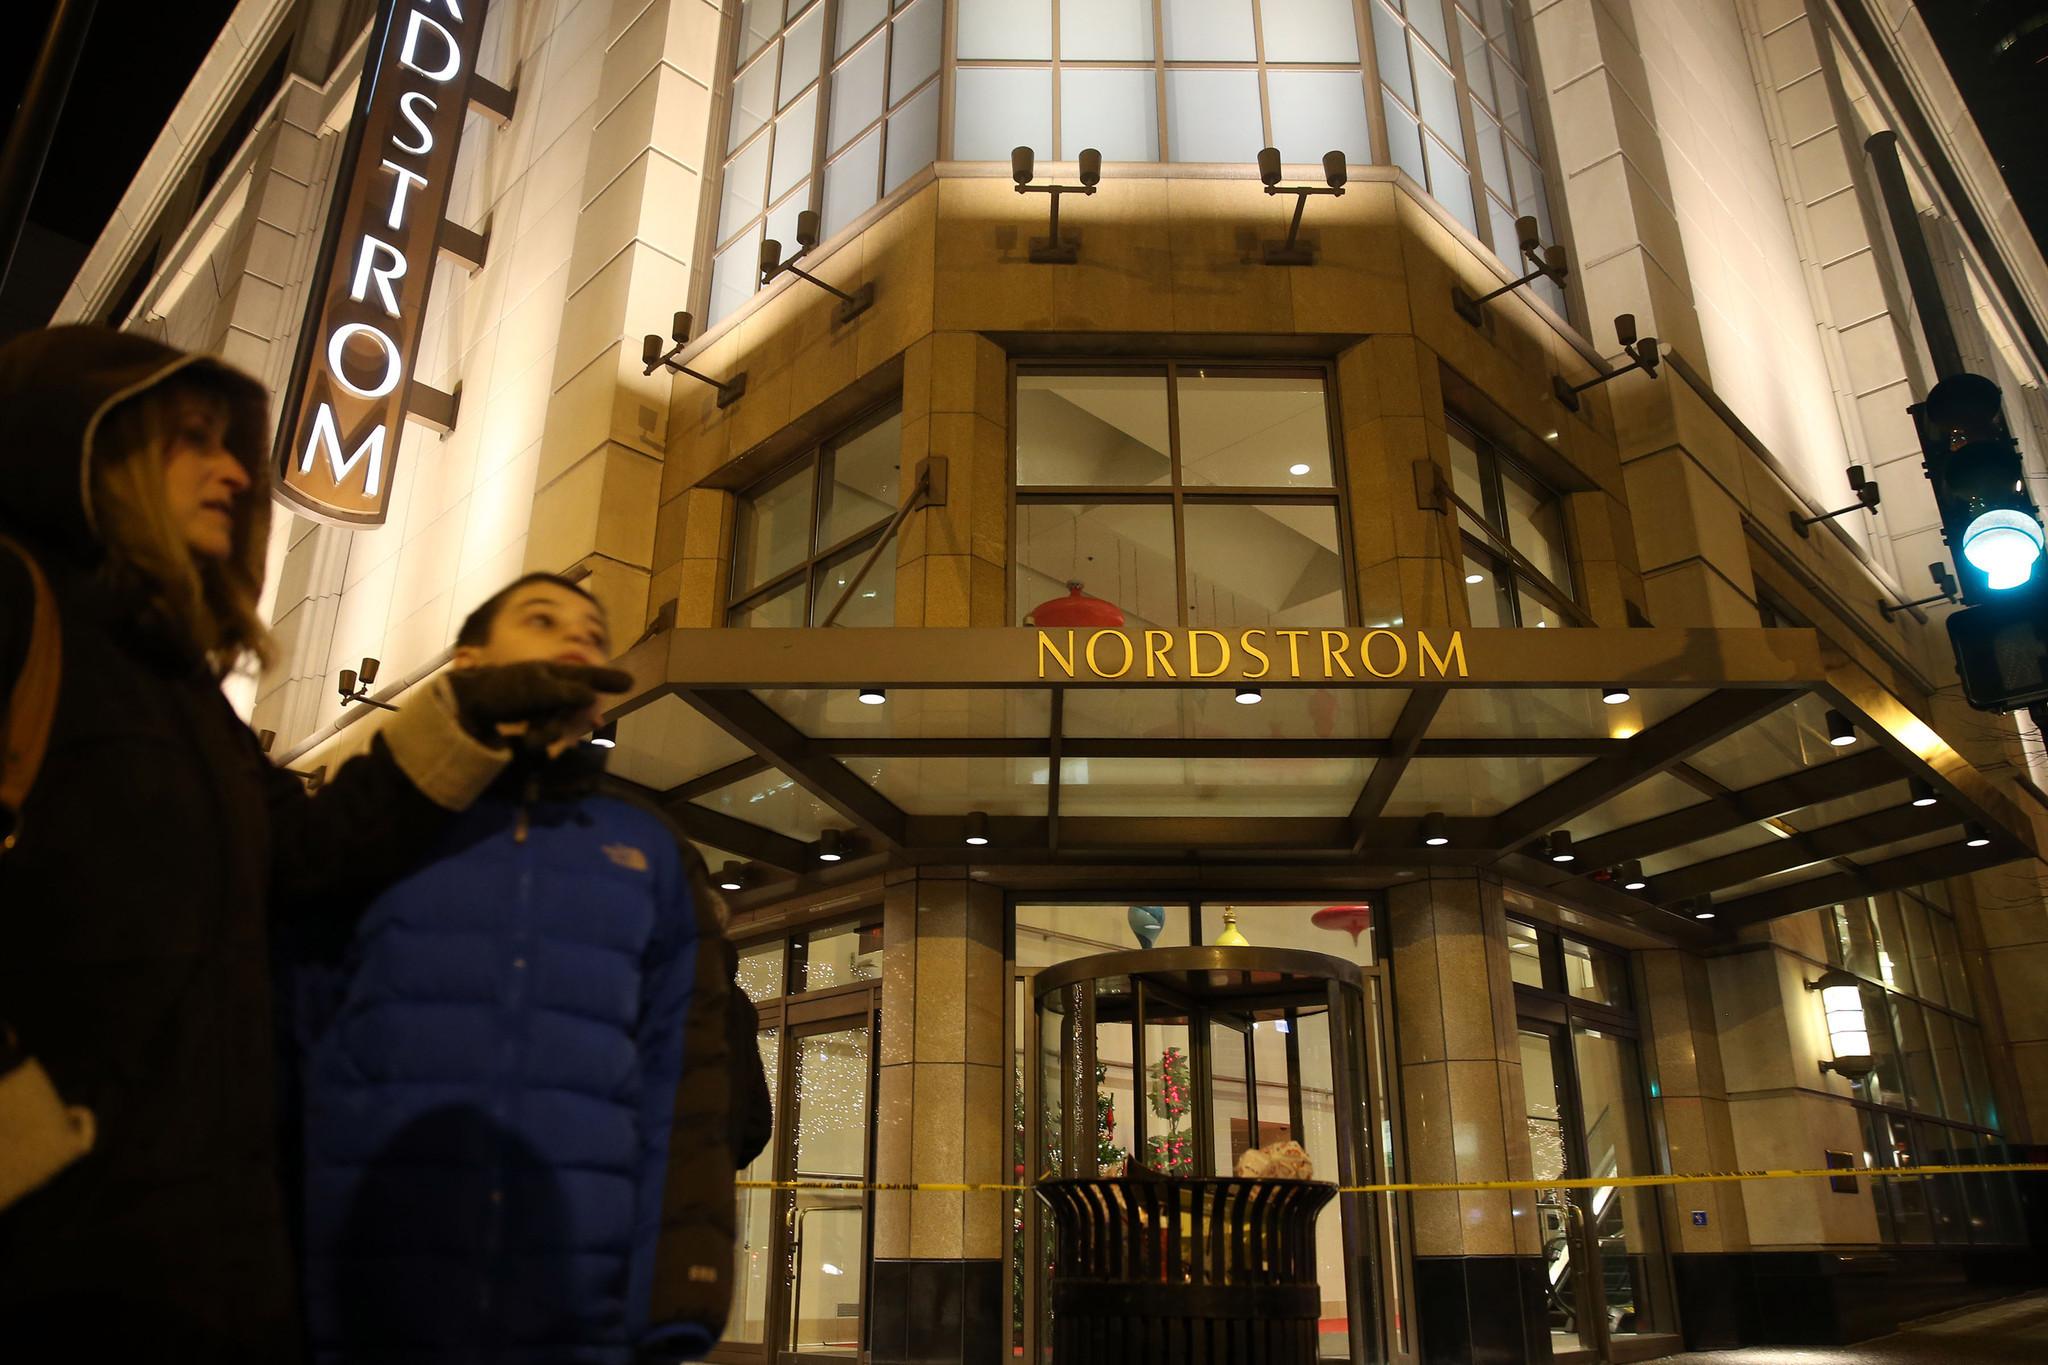 Gold Strappy Sandals: Nordstrom Michigan Avenue